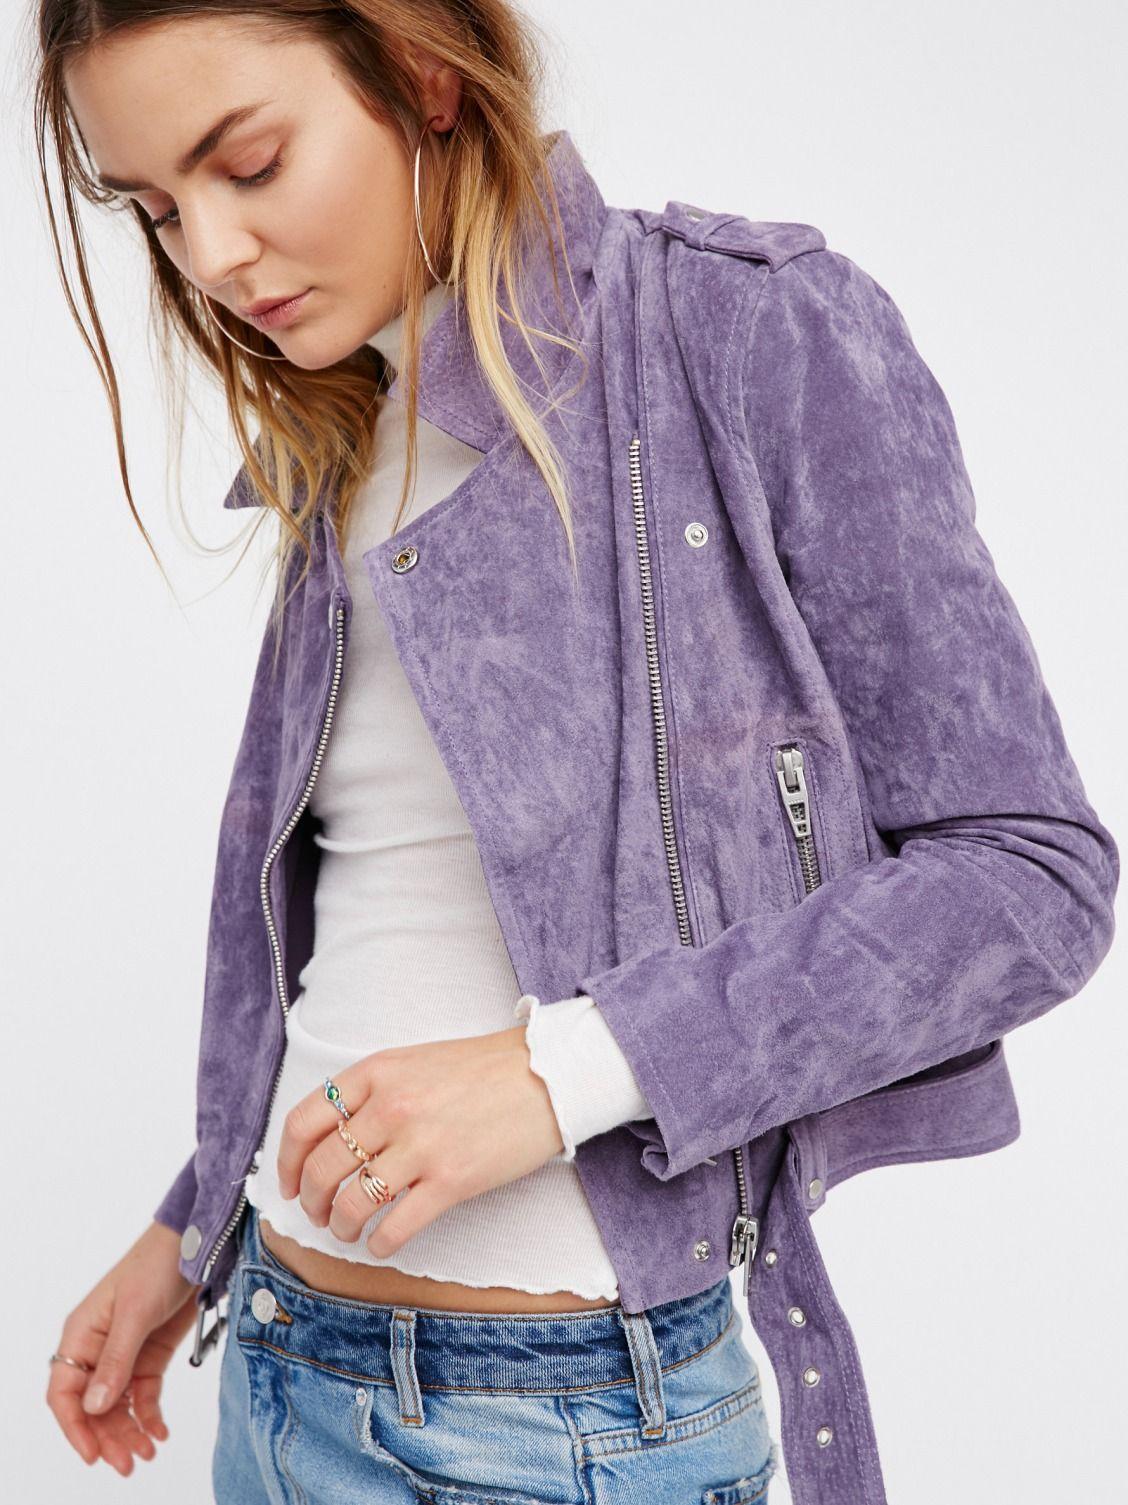 Suede Moto Jacket Fashion Lavender Outfit Purple Outfits [ 1505 x 1128 Pixel ]